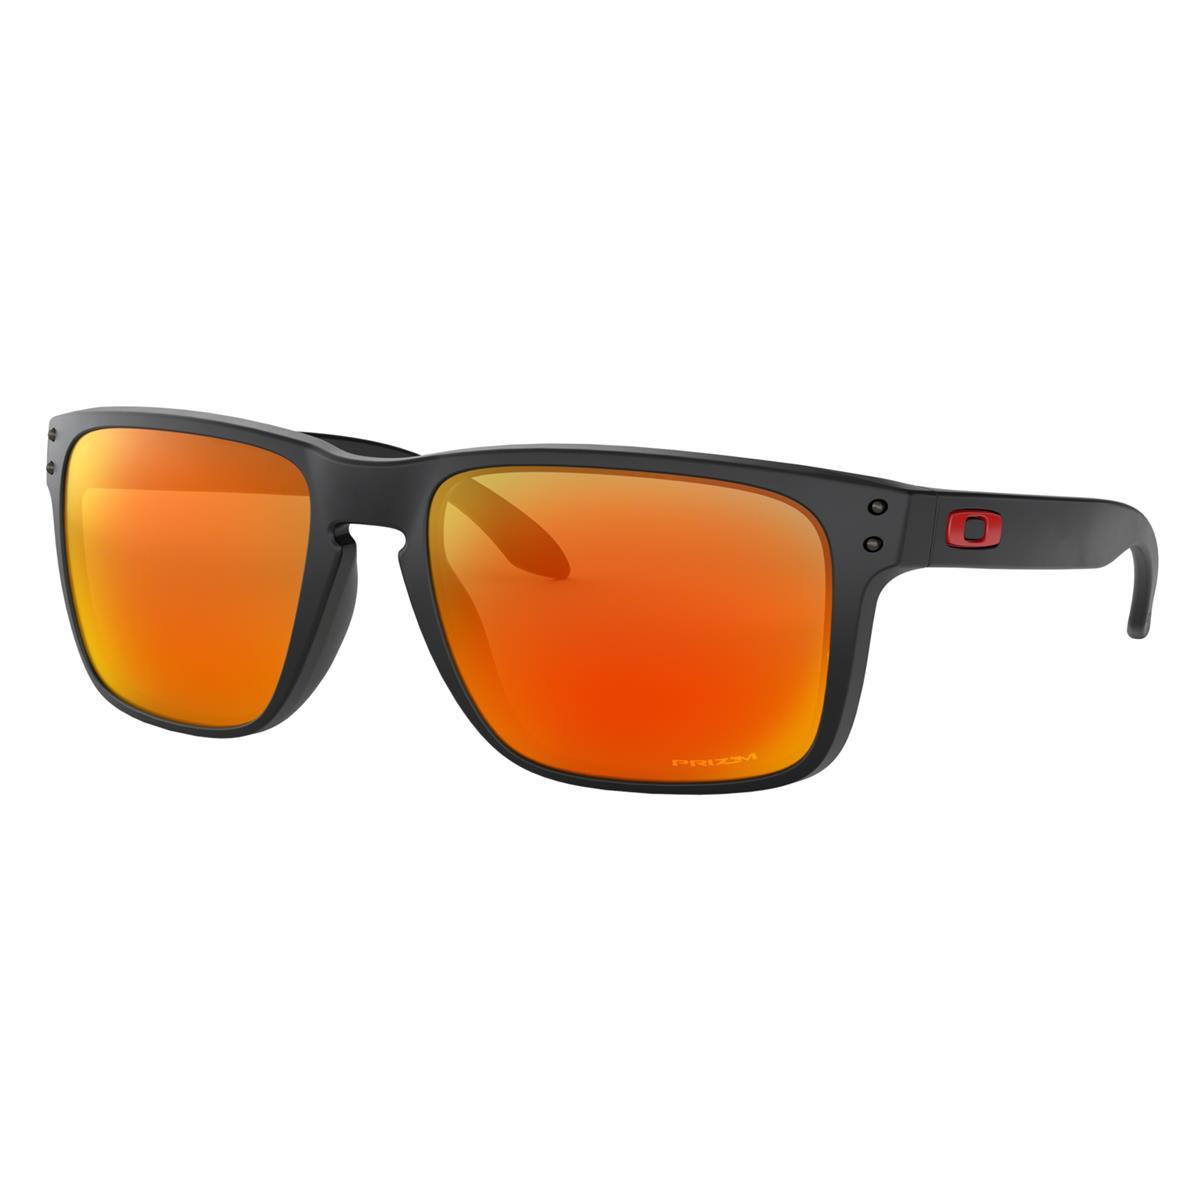 Oakley Sonnenbrille Holbrook XL Matt Schwarz - Prizm Ruby